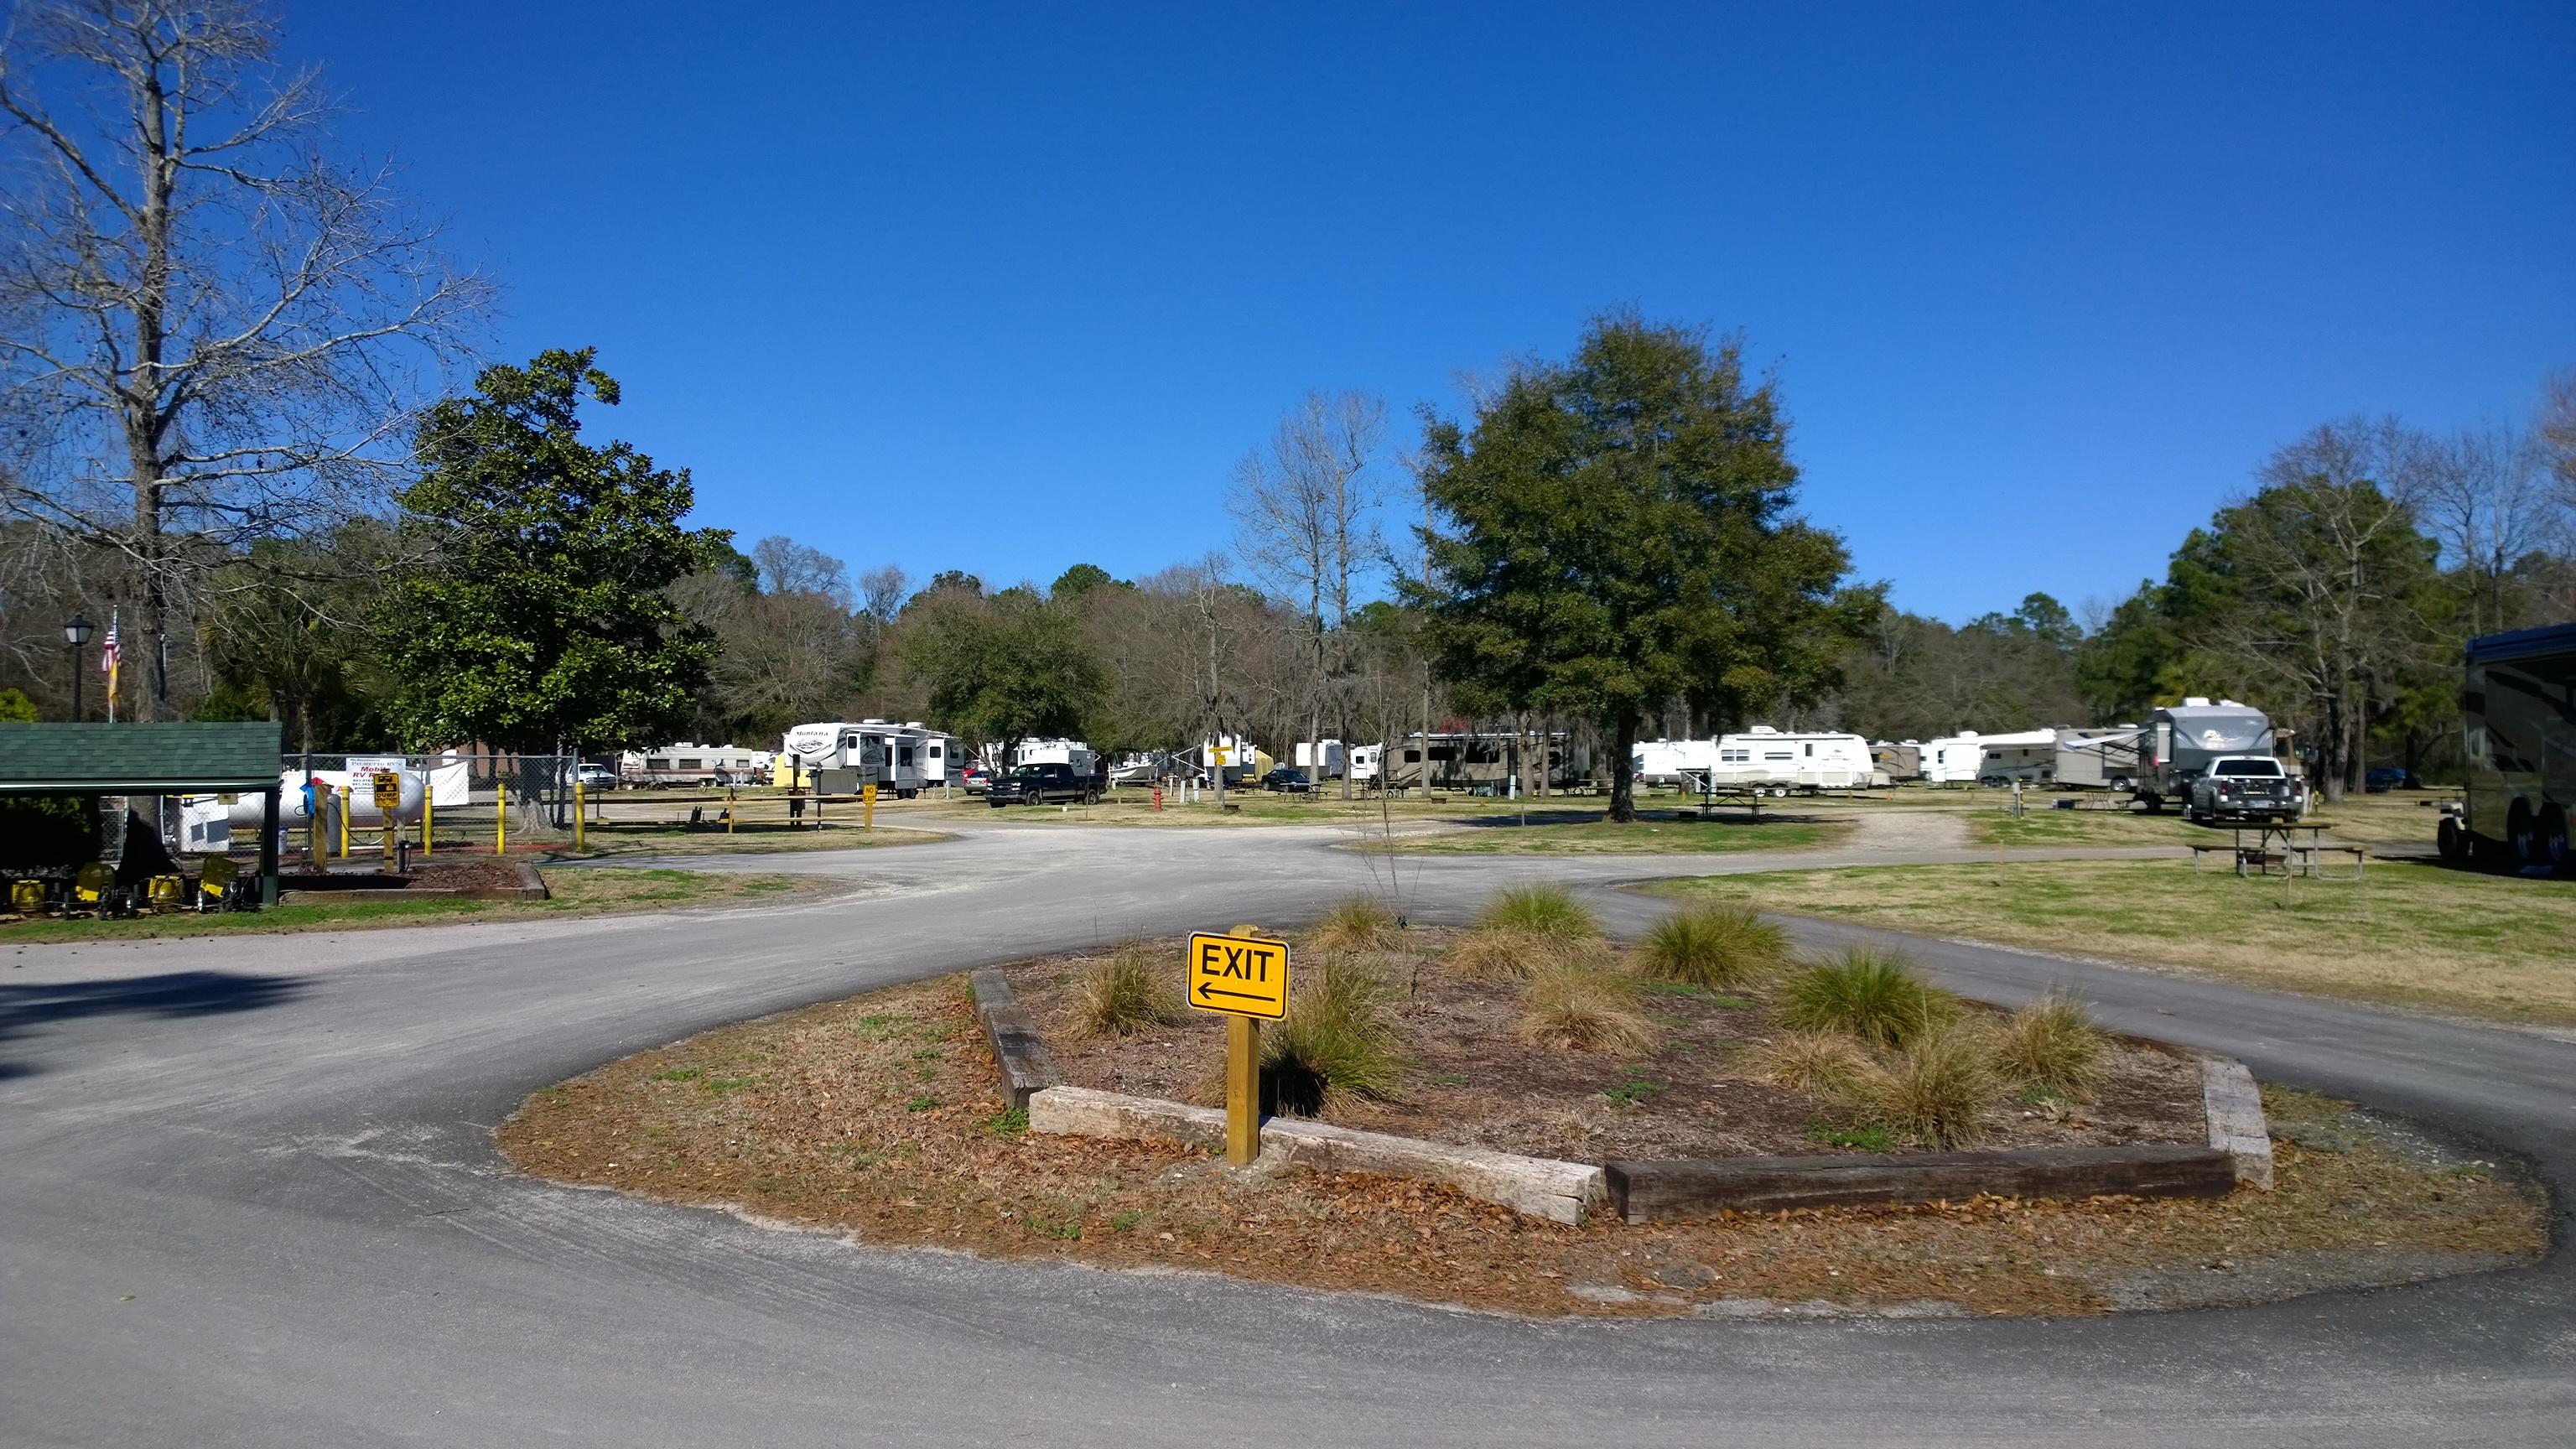 Mount Pleasant Rv Parks Reviews And Photos Rvparking Com